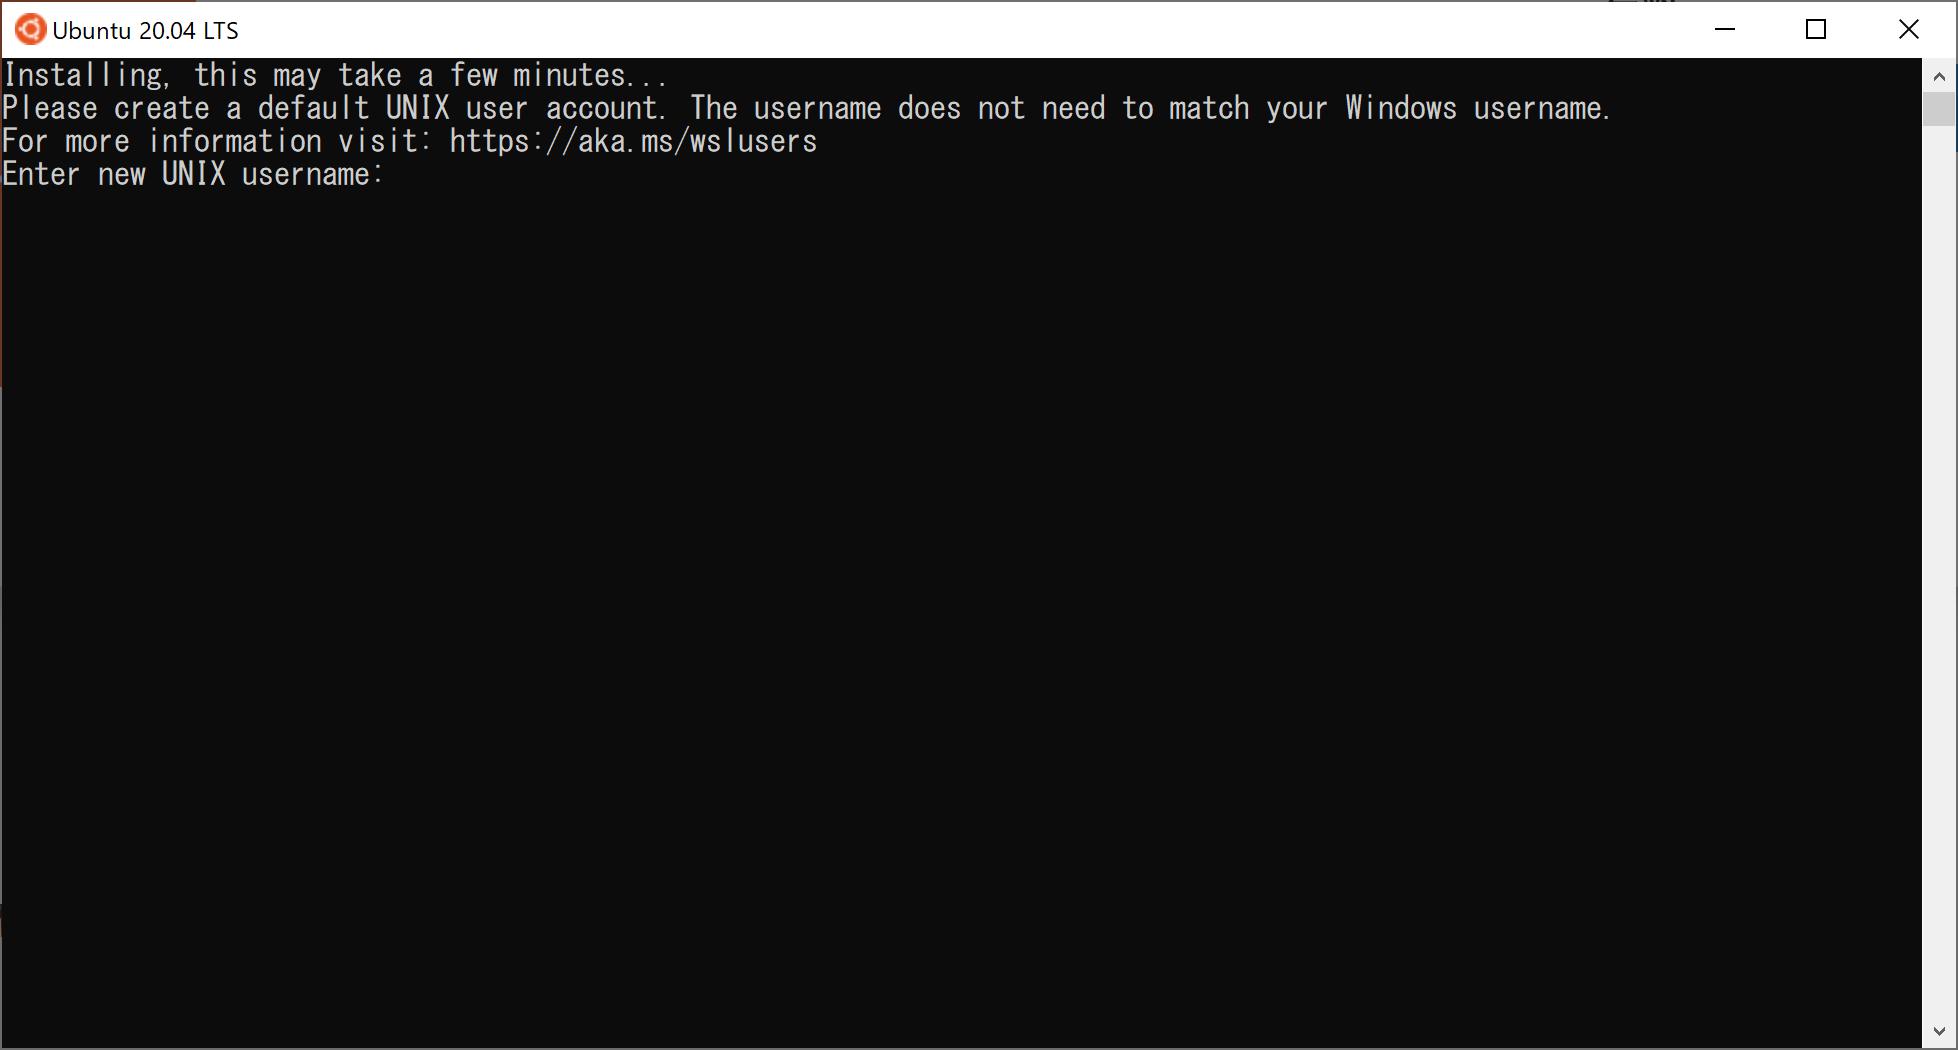 Windowsサブシステムの「Ubuntu 20.04 LTS」のインストール途中でも求められるユーザ名作成の画面